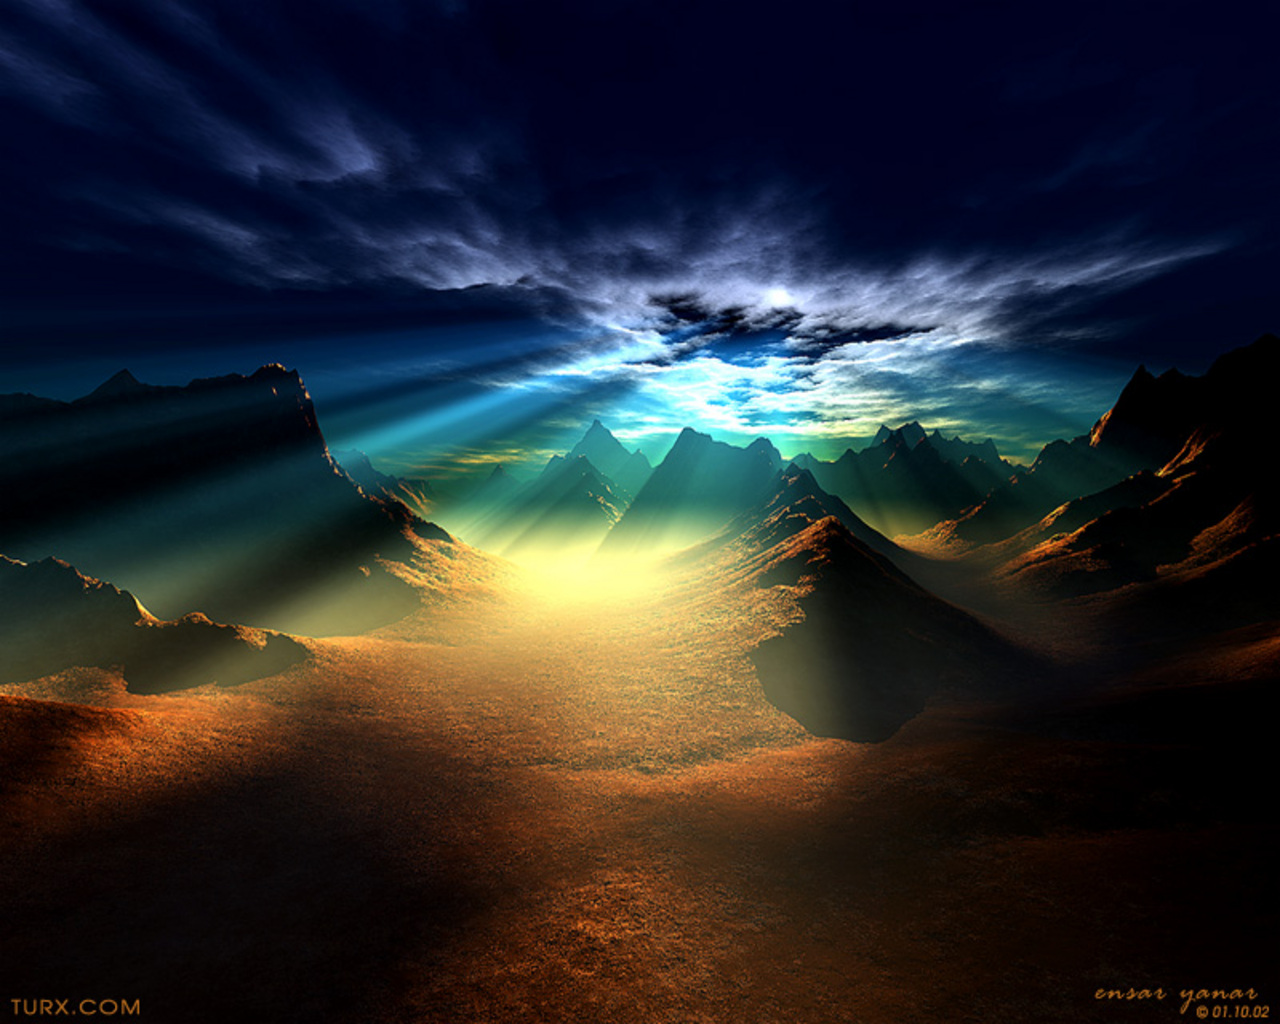 http://2.bp.blogspot.com/-vZrnciL_bN4/T1TMUOt_I0I/AAAAAAAADBg/TWCJmeAQs_I/s1600/desert-hd-wallpaper-sun.jpg